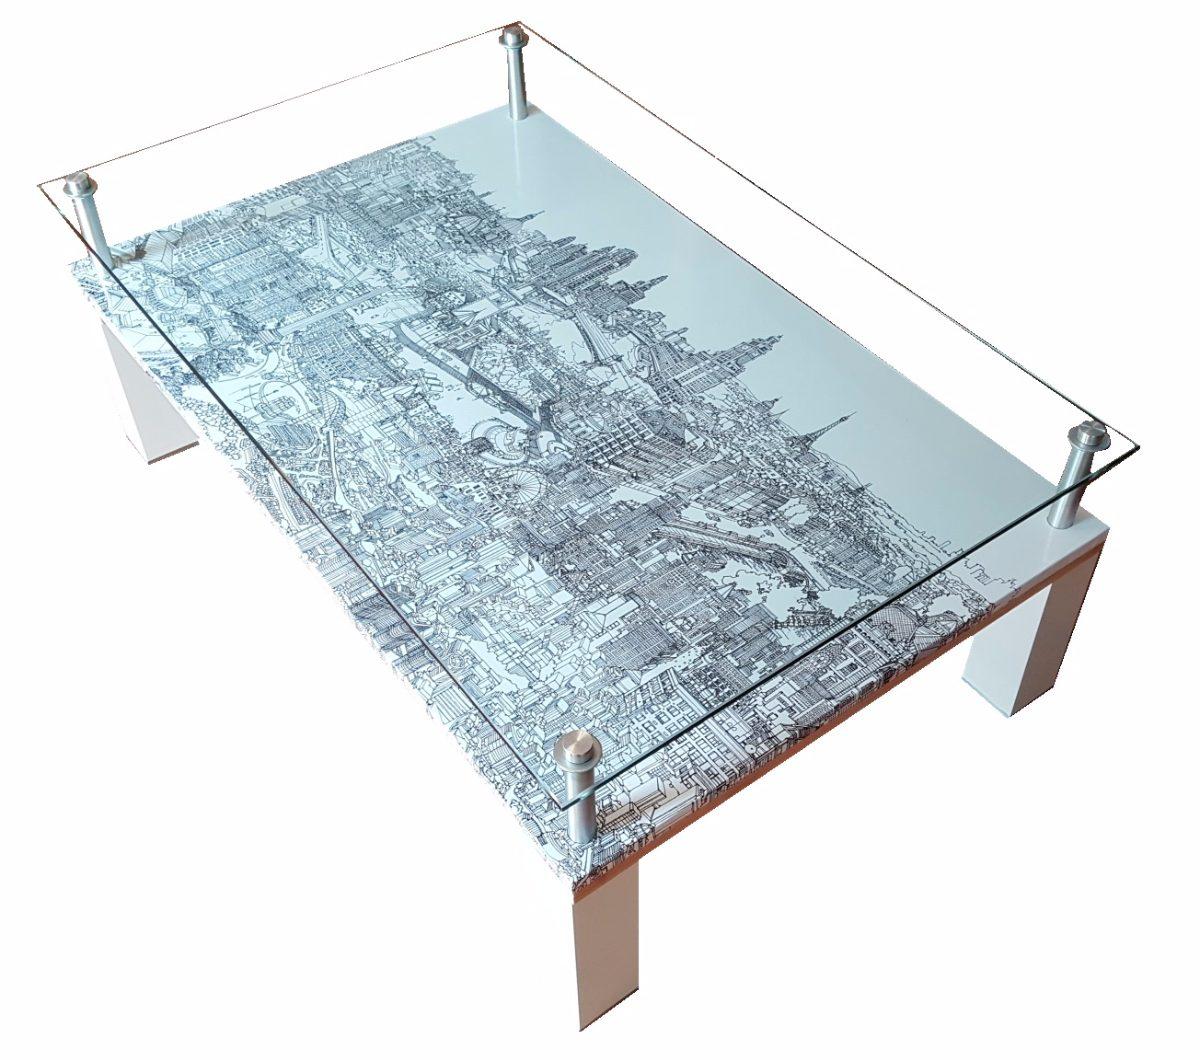 Fantástico Muebles Otomana Asequible Friso - Muebles Para Ideas de ...